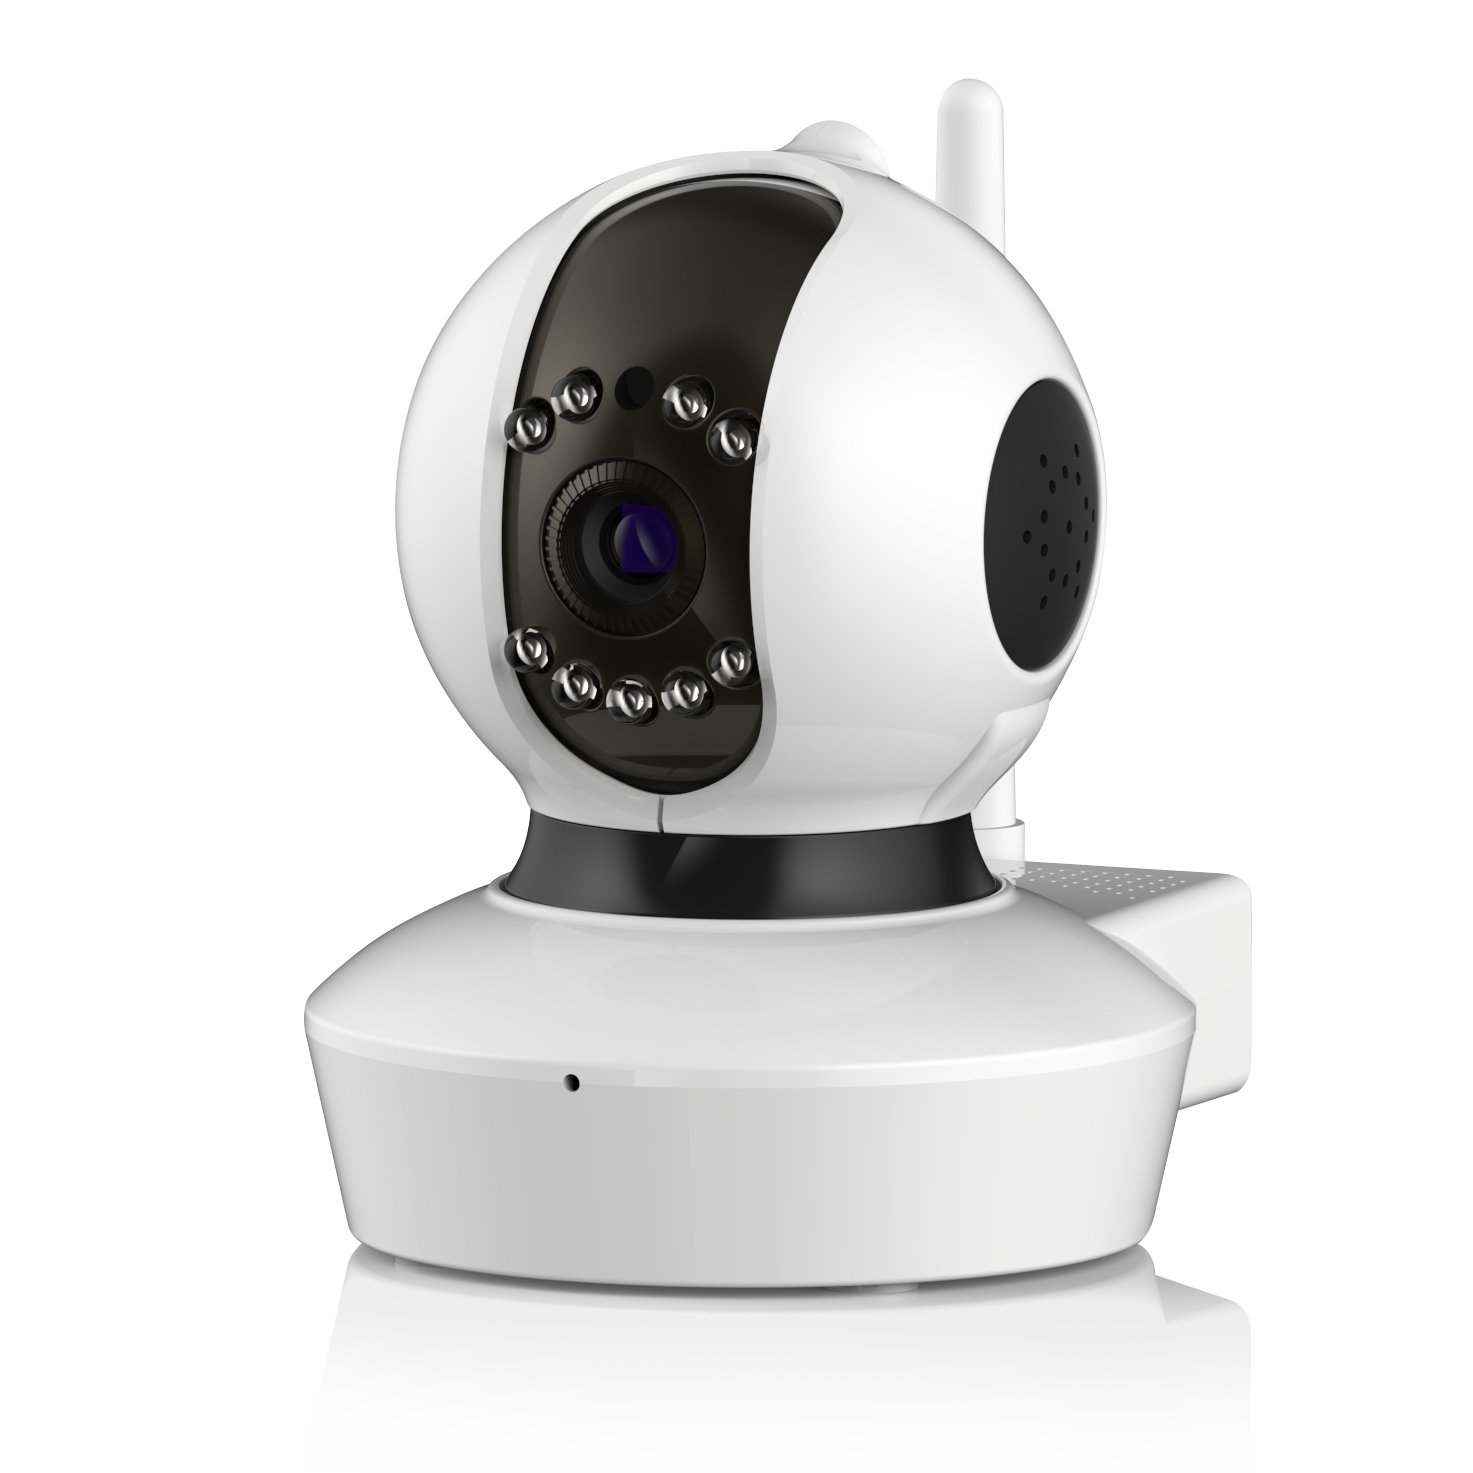 Security /Surveillances,Amazon.com